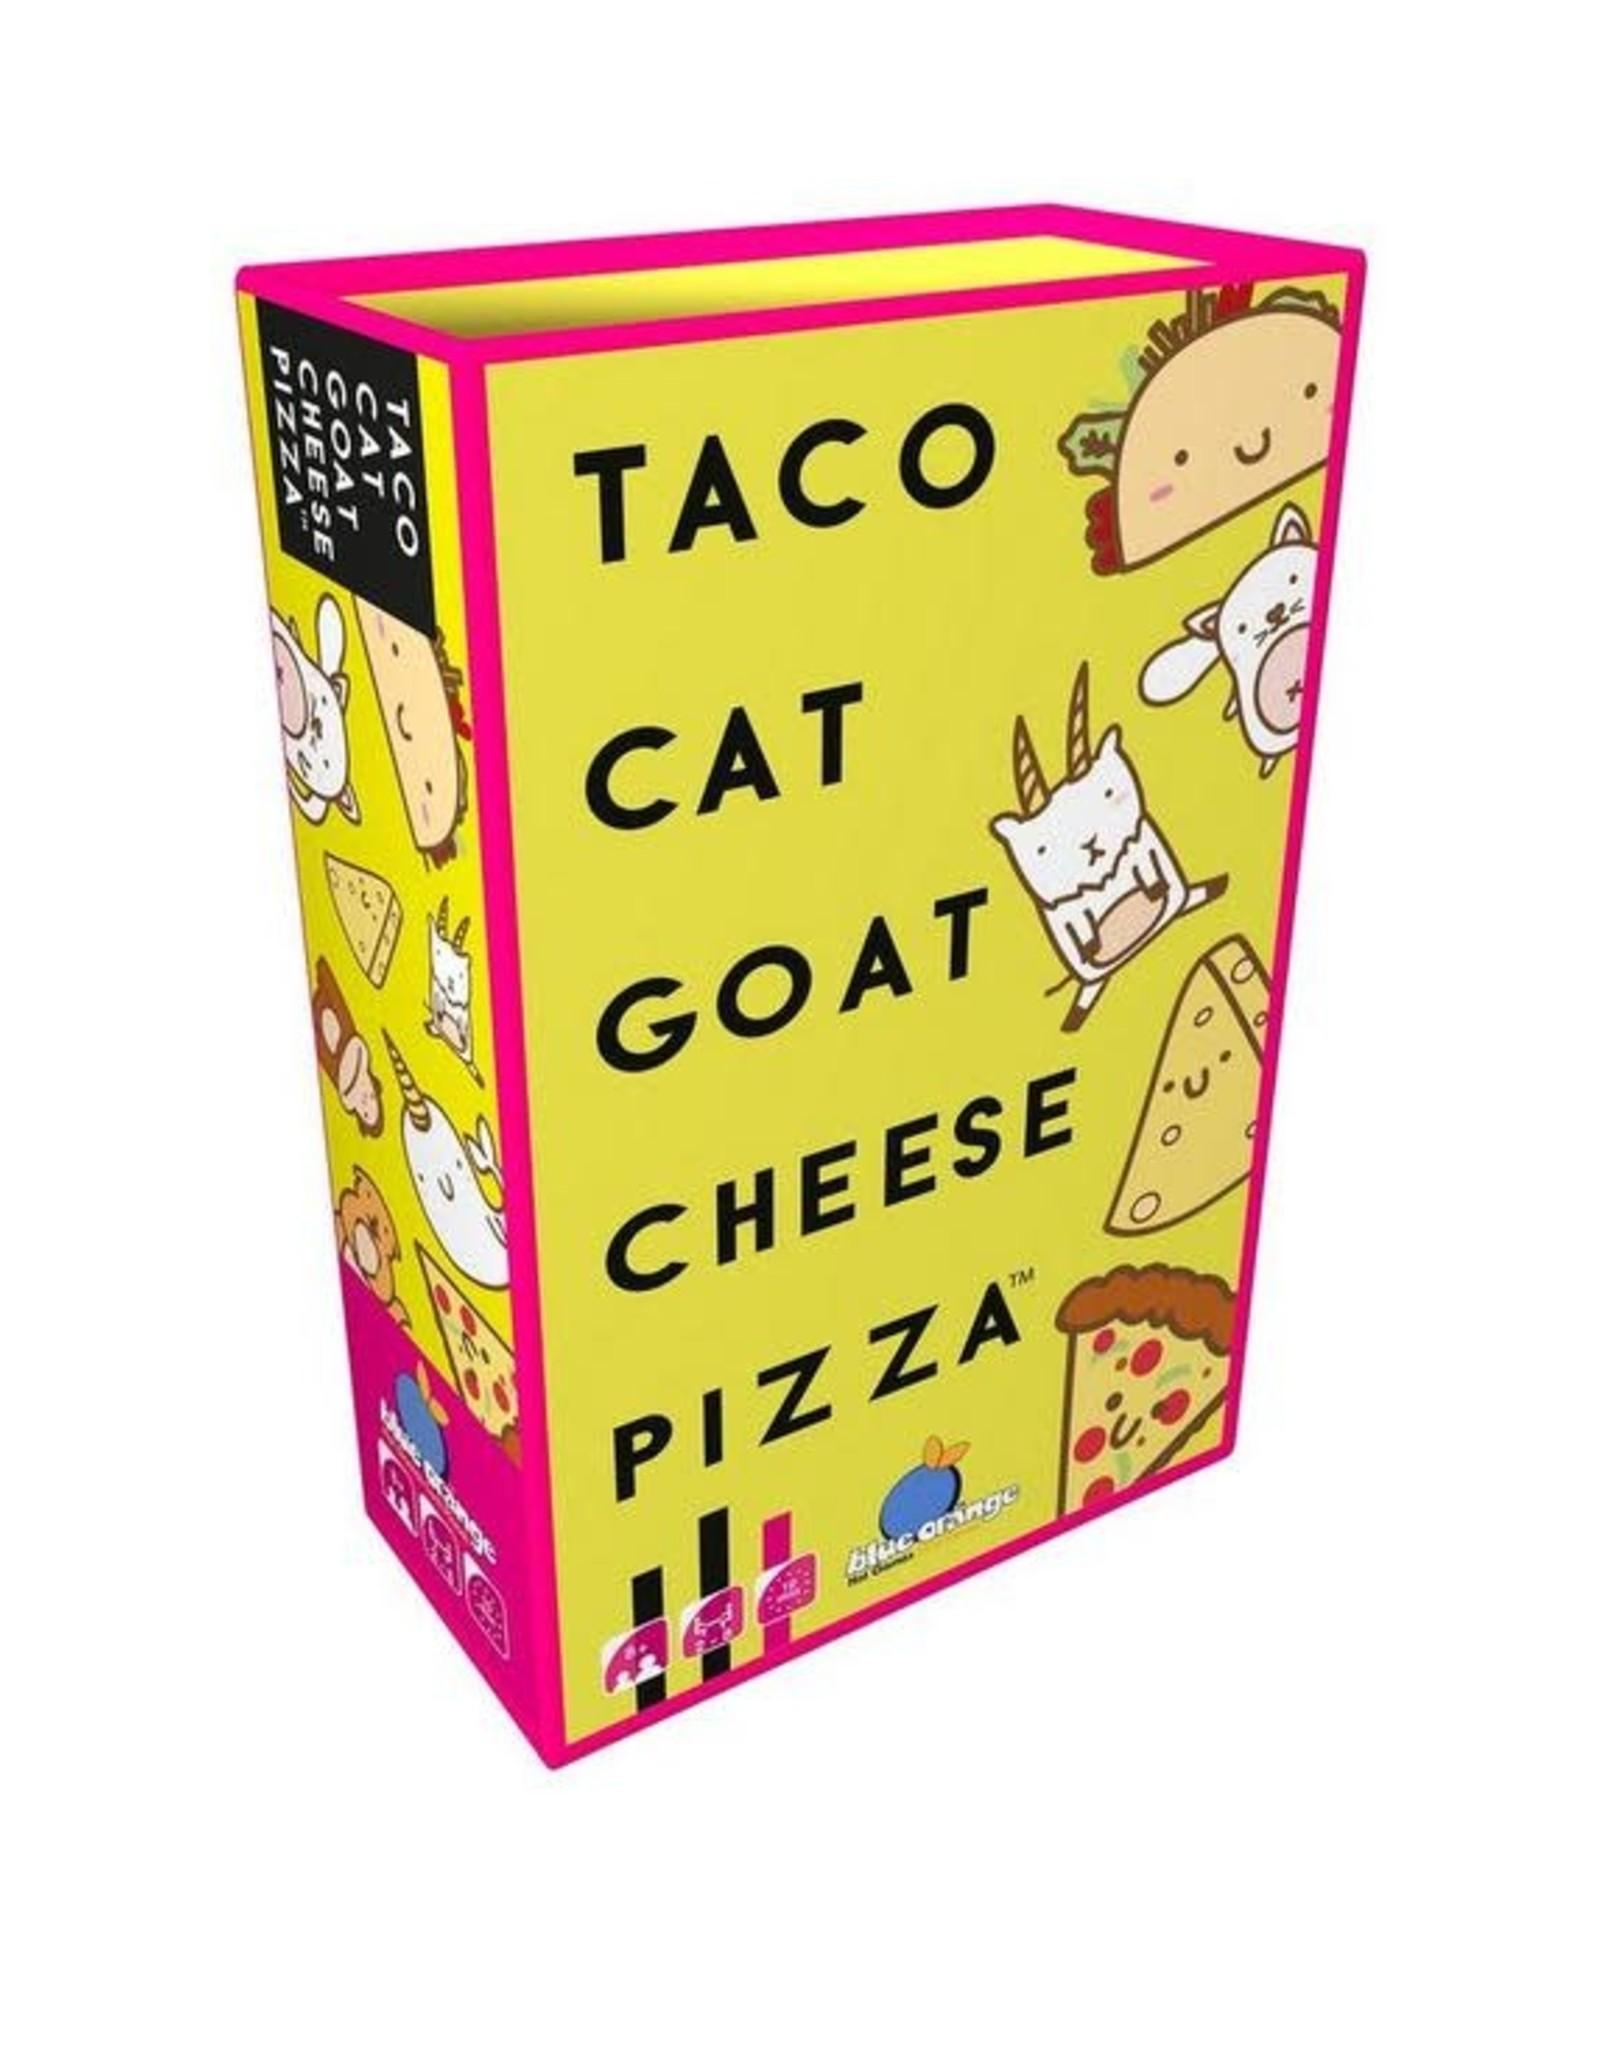 Blue Orange Taco Cat Goat Cheese Pizza